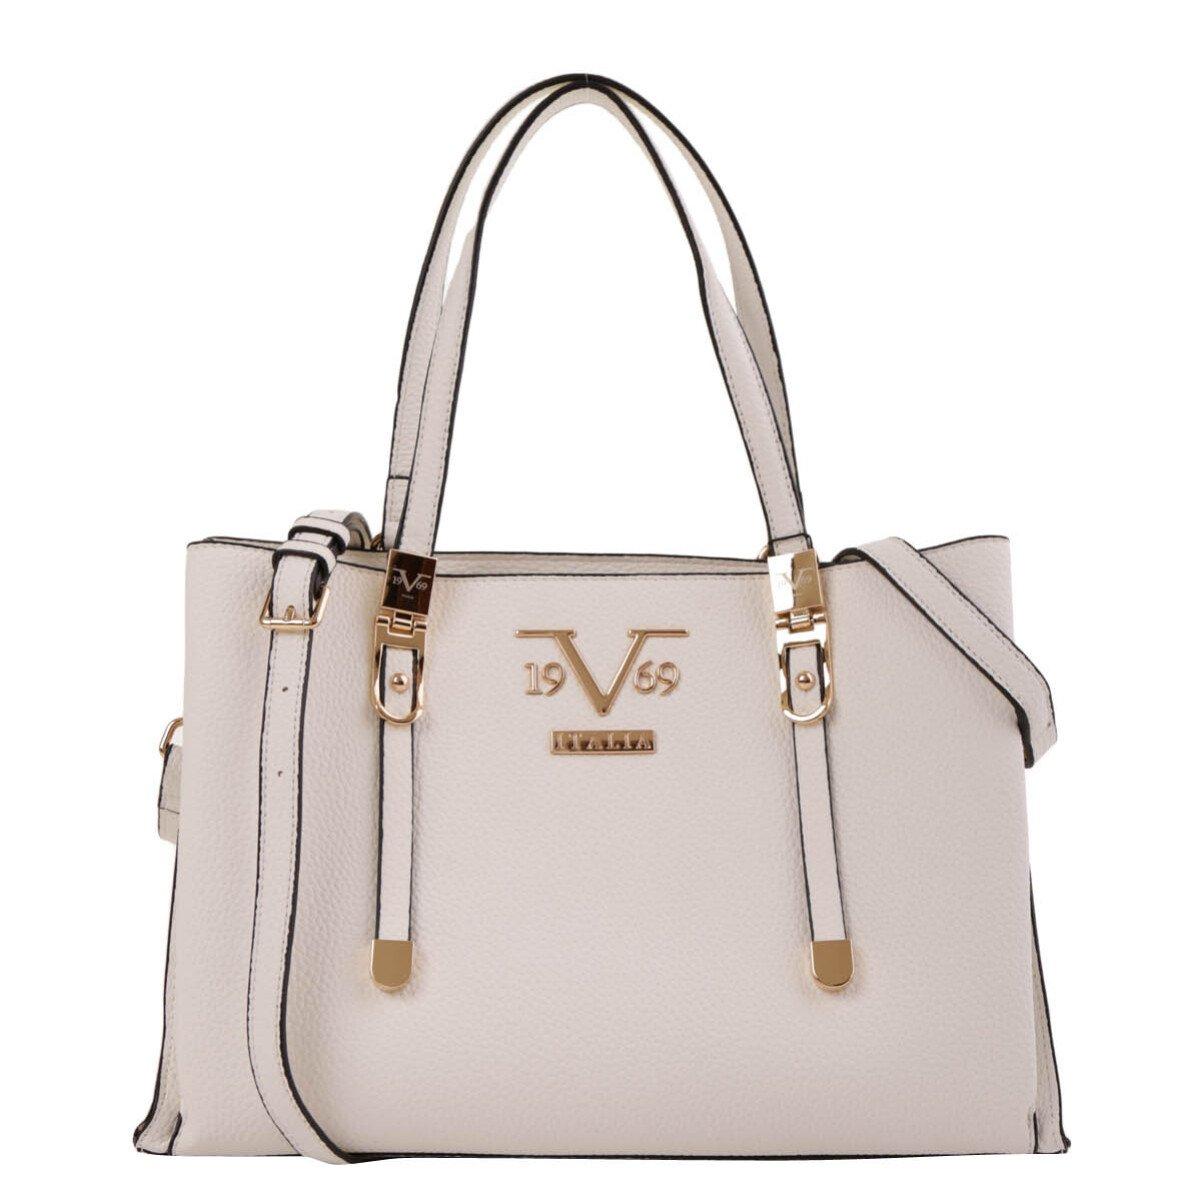 19v69 Italia Women's Handbag Various Colours 318969 - white UNICA